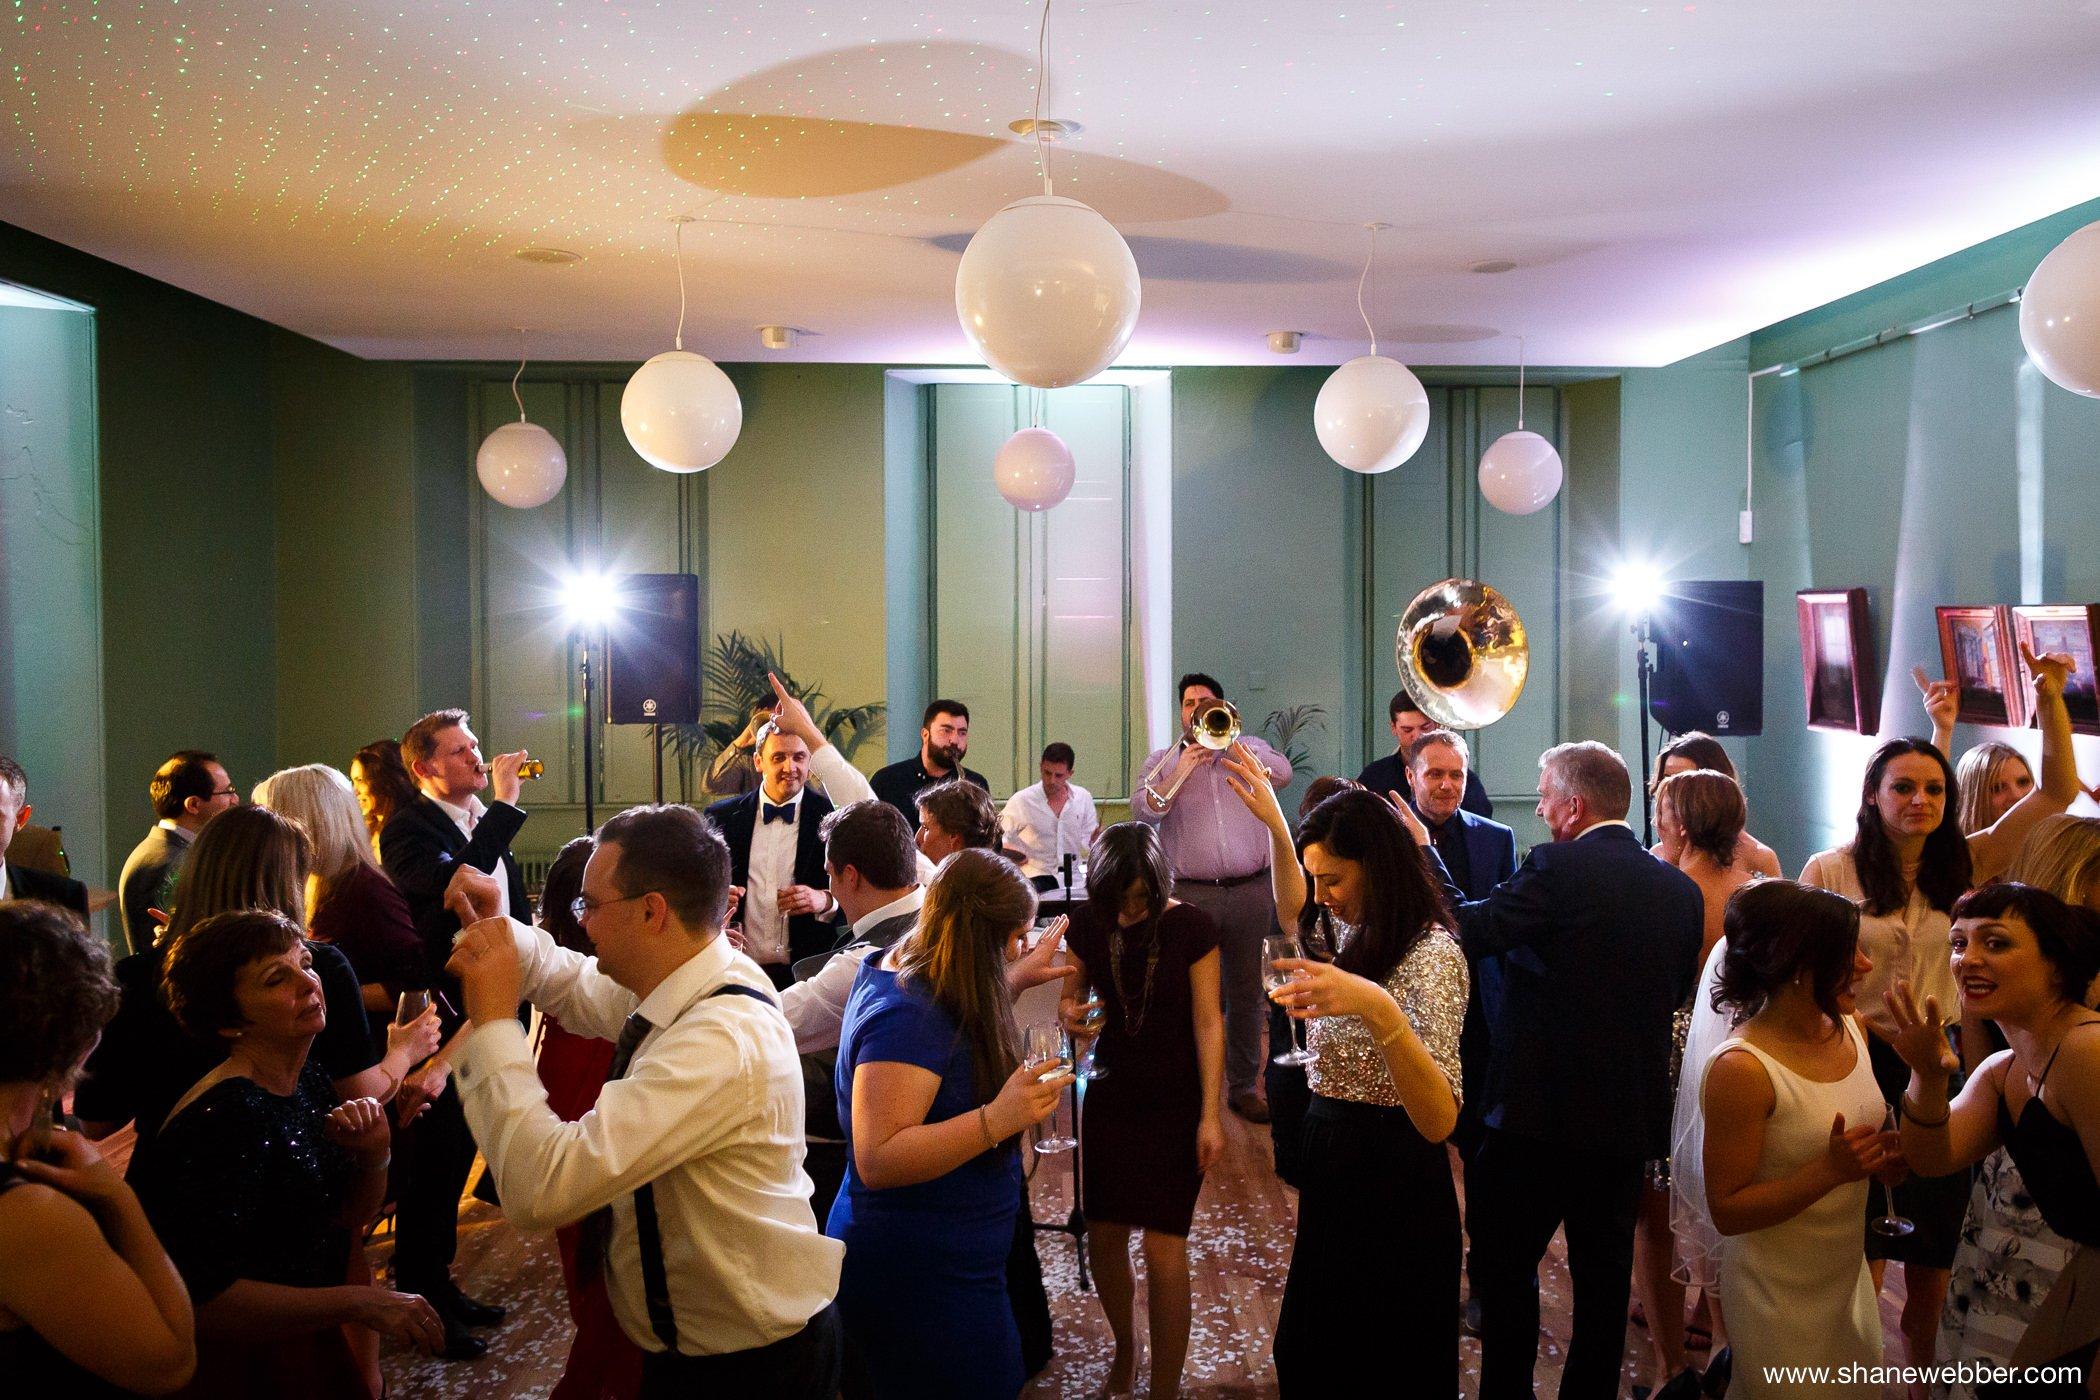 Manchester Art Gallery wedding photos